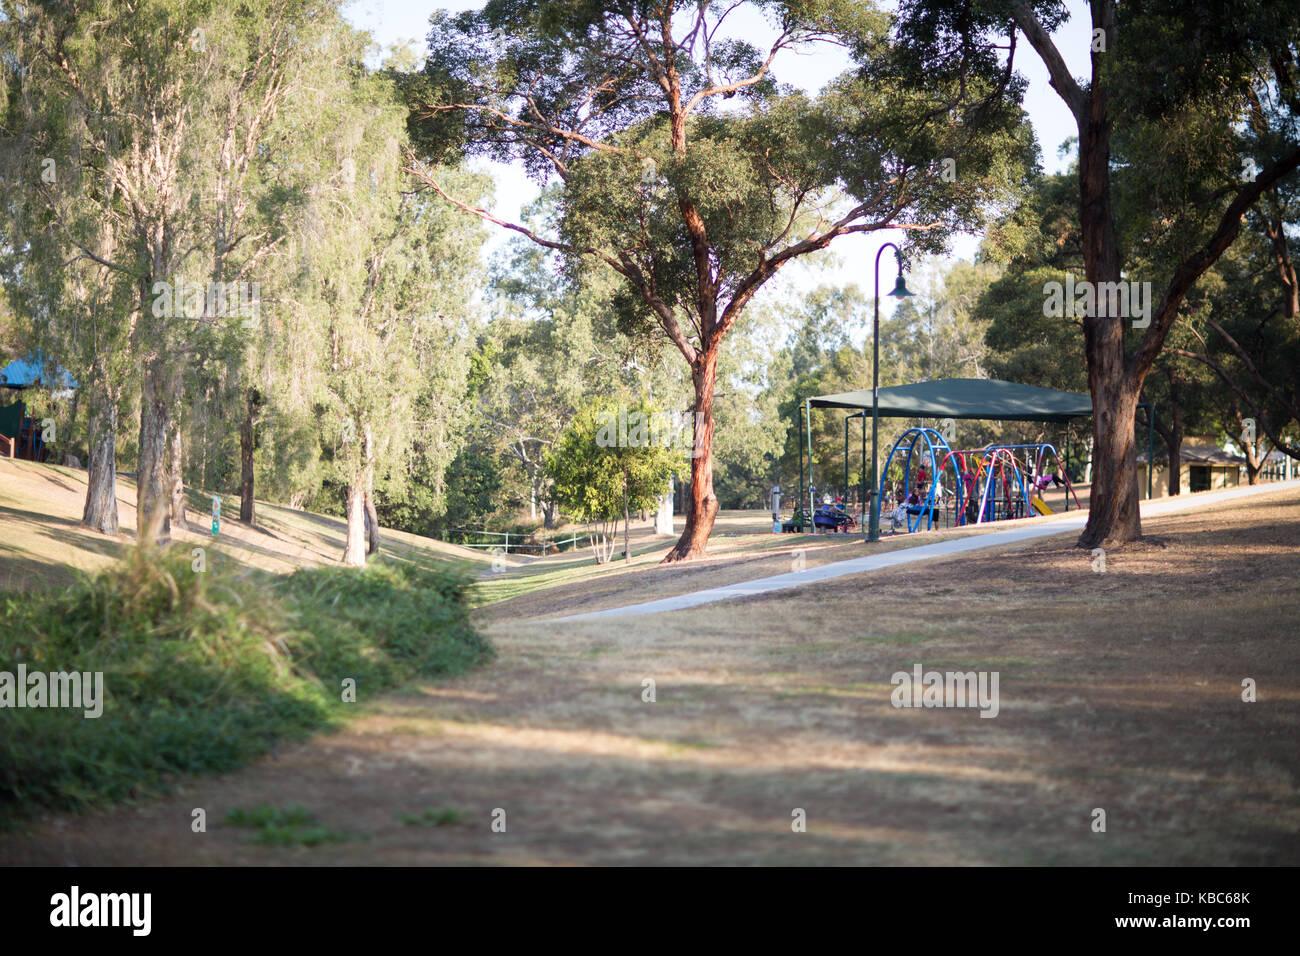 Playground and park in inner Brisbane Suburb - Stock Image